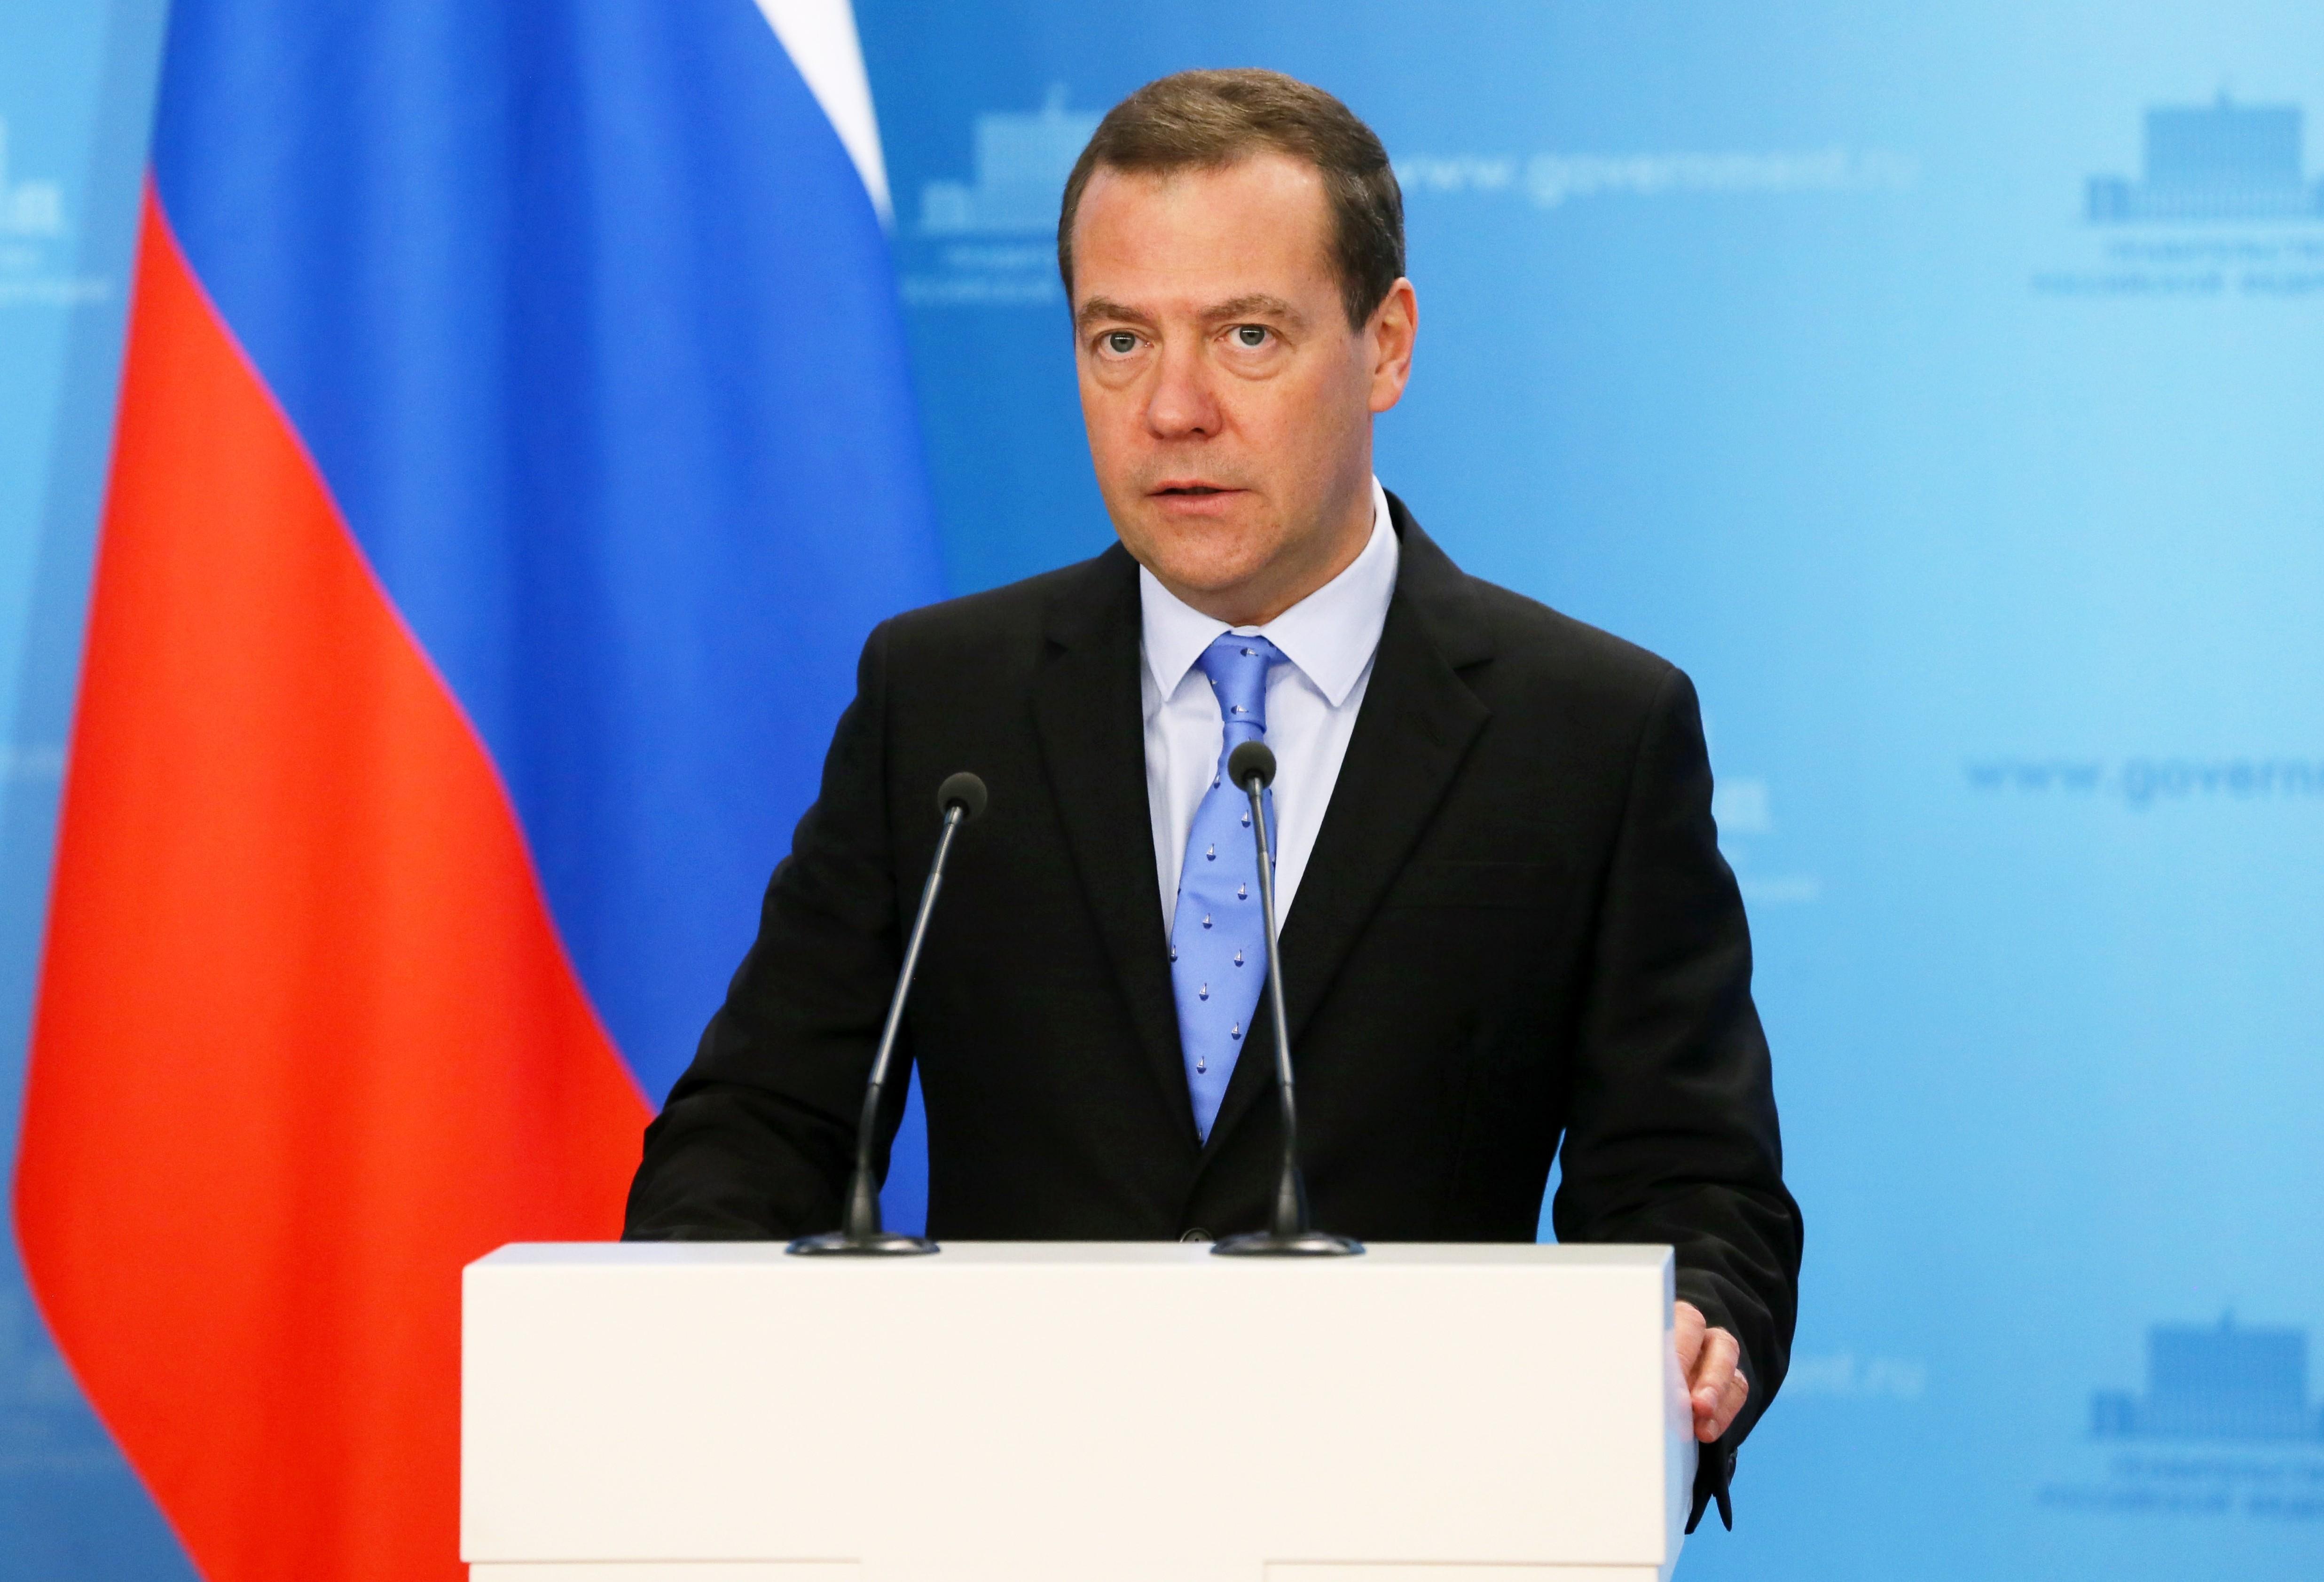 <p><span>Премьер-министр РФ Дмитрий Медведев. Фото: &copy;РИА Новости/</span>Екатерина Штукина</p>